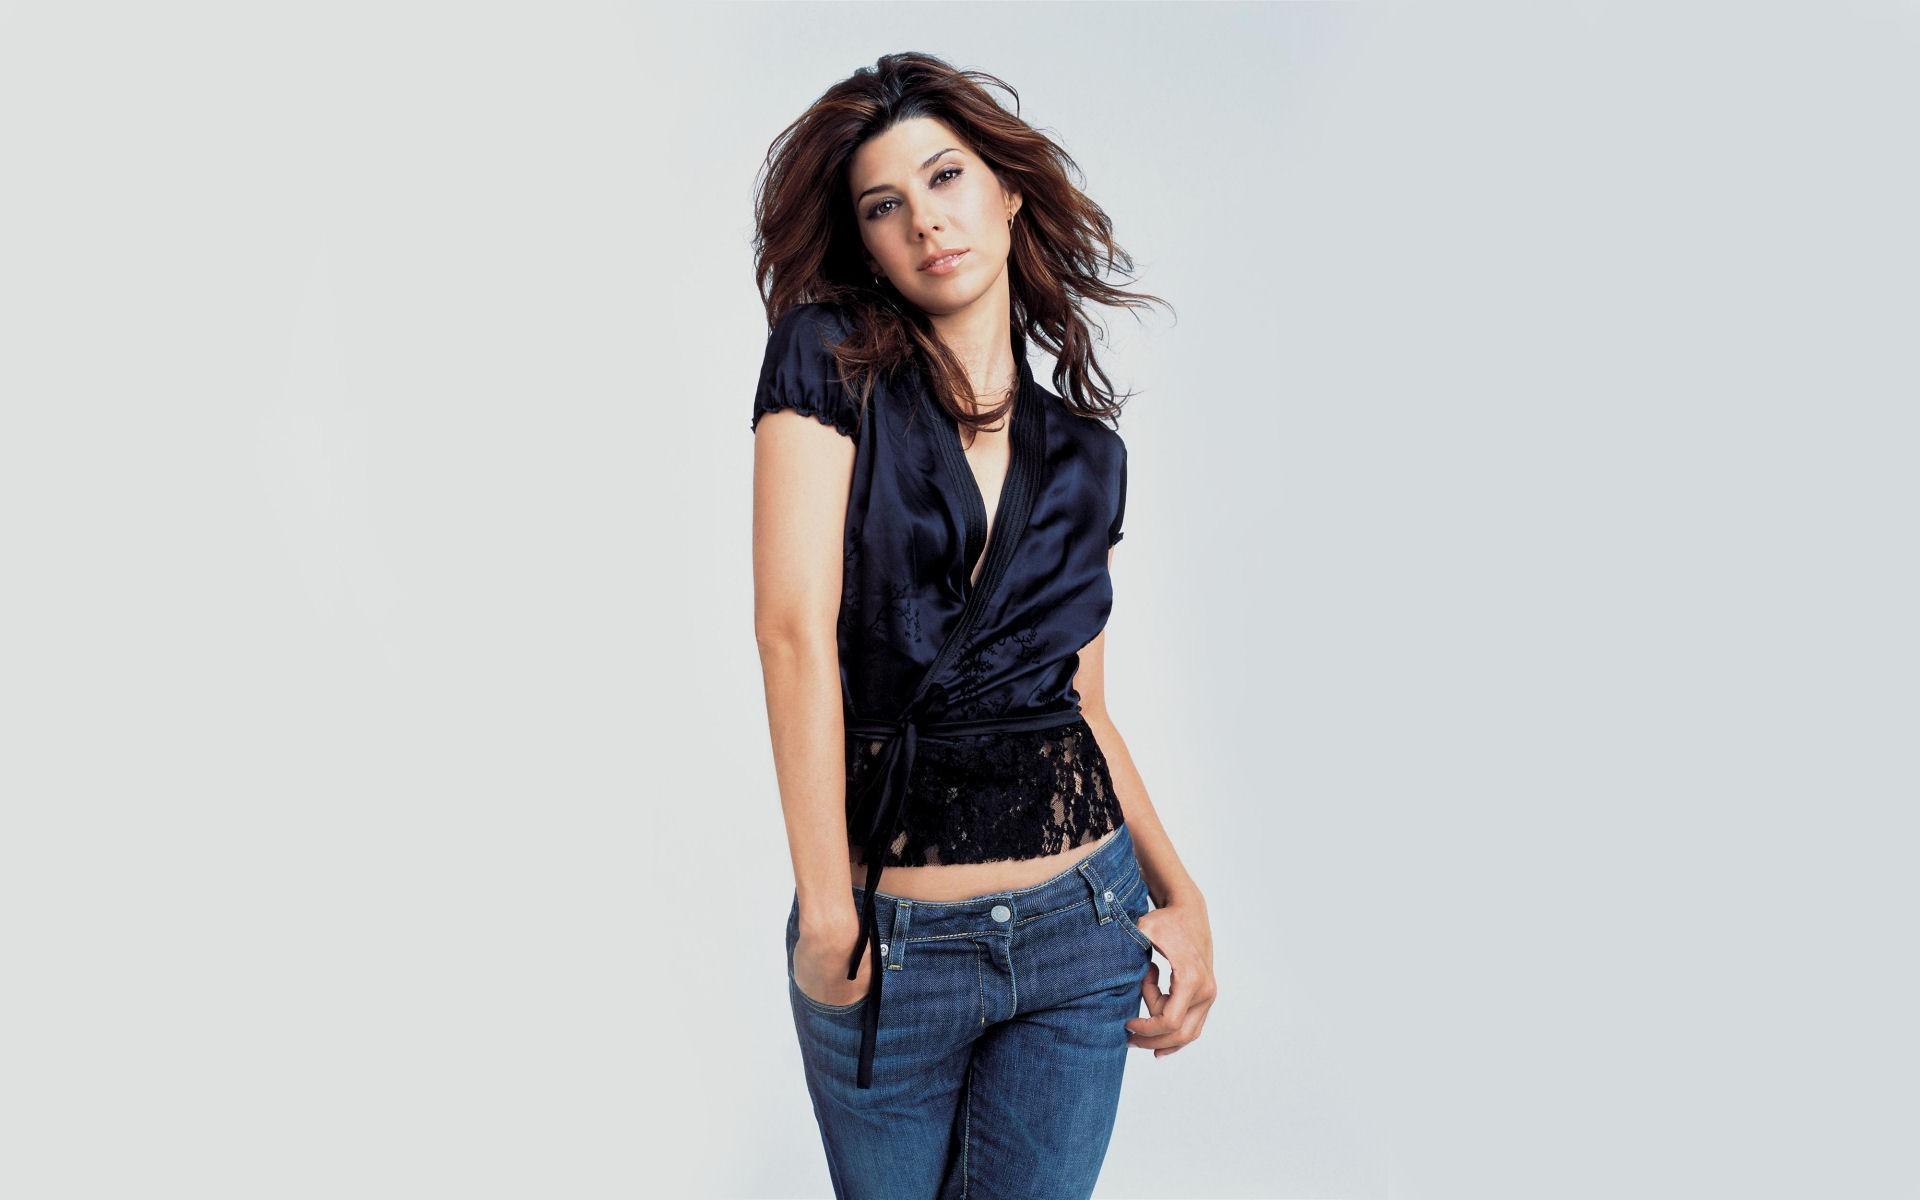 10 HD Marisa Tomei Wal...